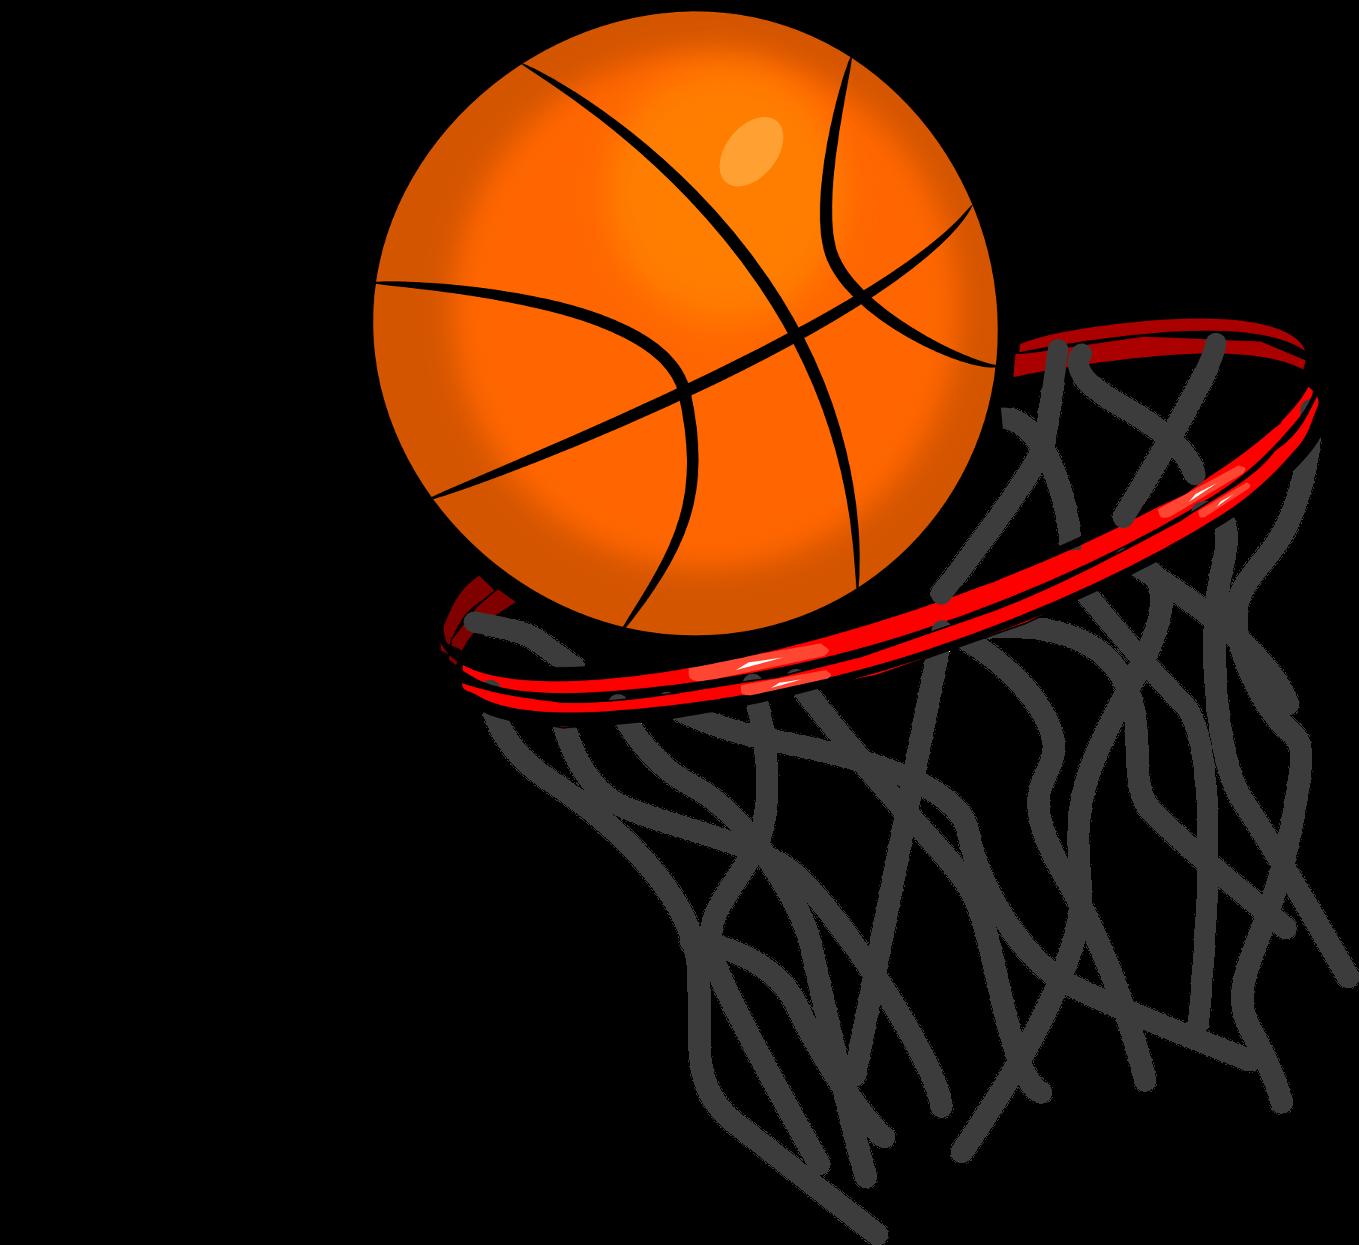 Clipart basketball grey. Brennan leathers southwest georgia